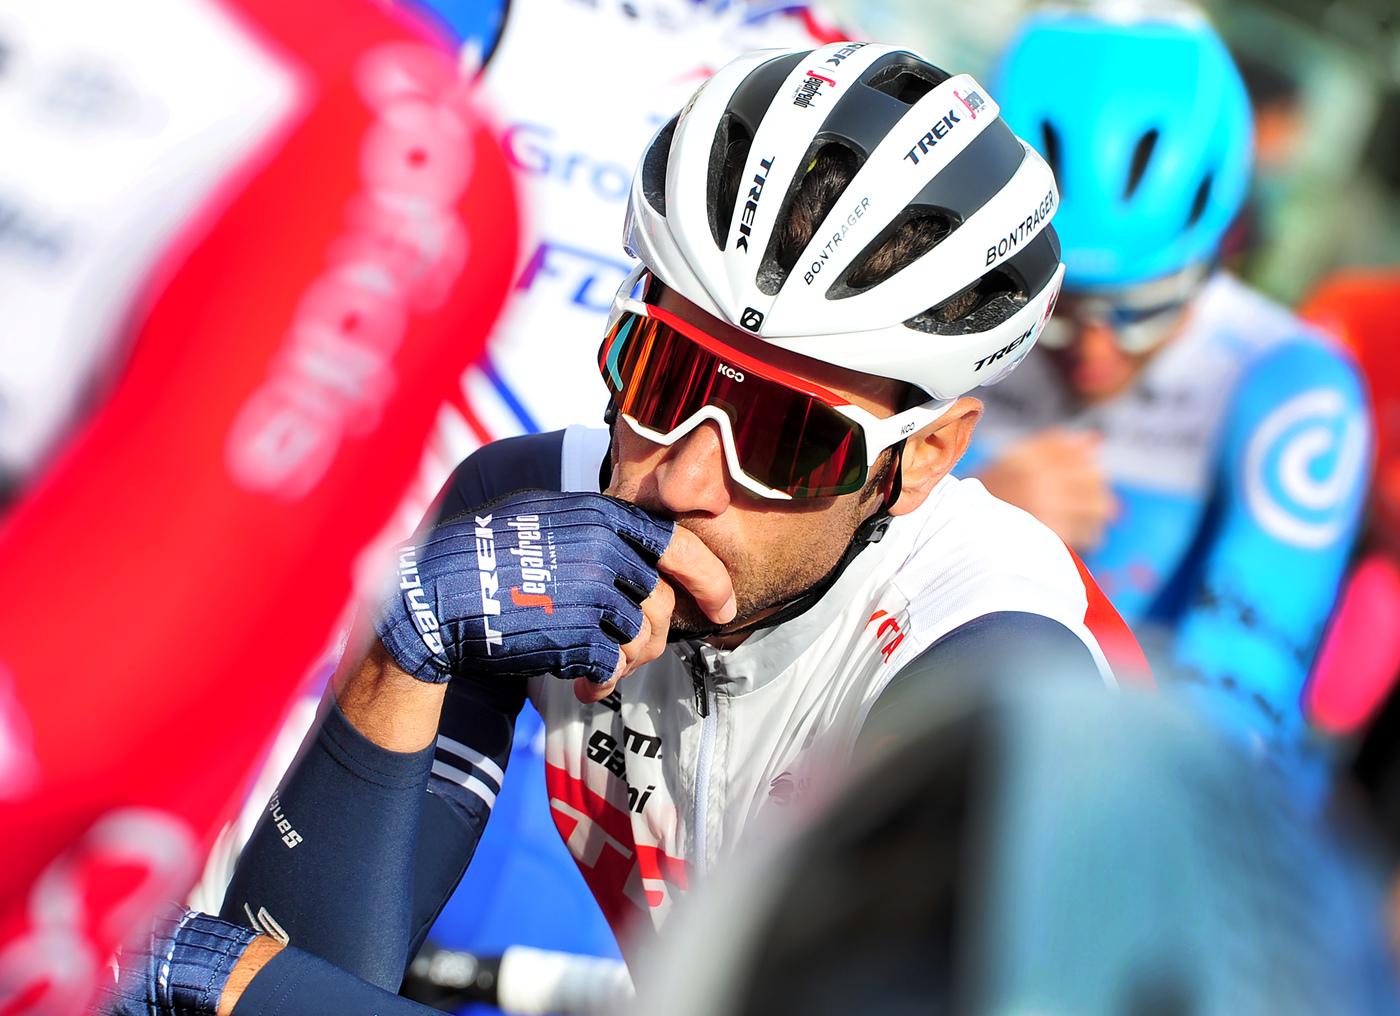 Vincenzo Nibali debutterà alla Volta a la Comunitat Valenciana. Troverà Bernal e Pogacar!